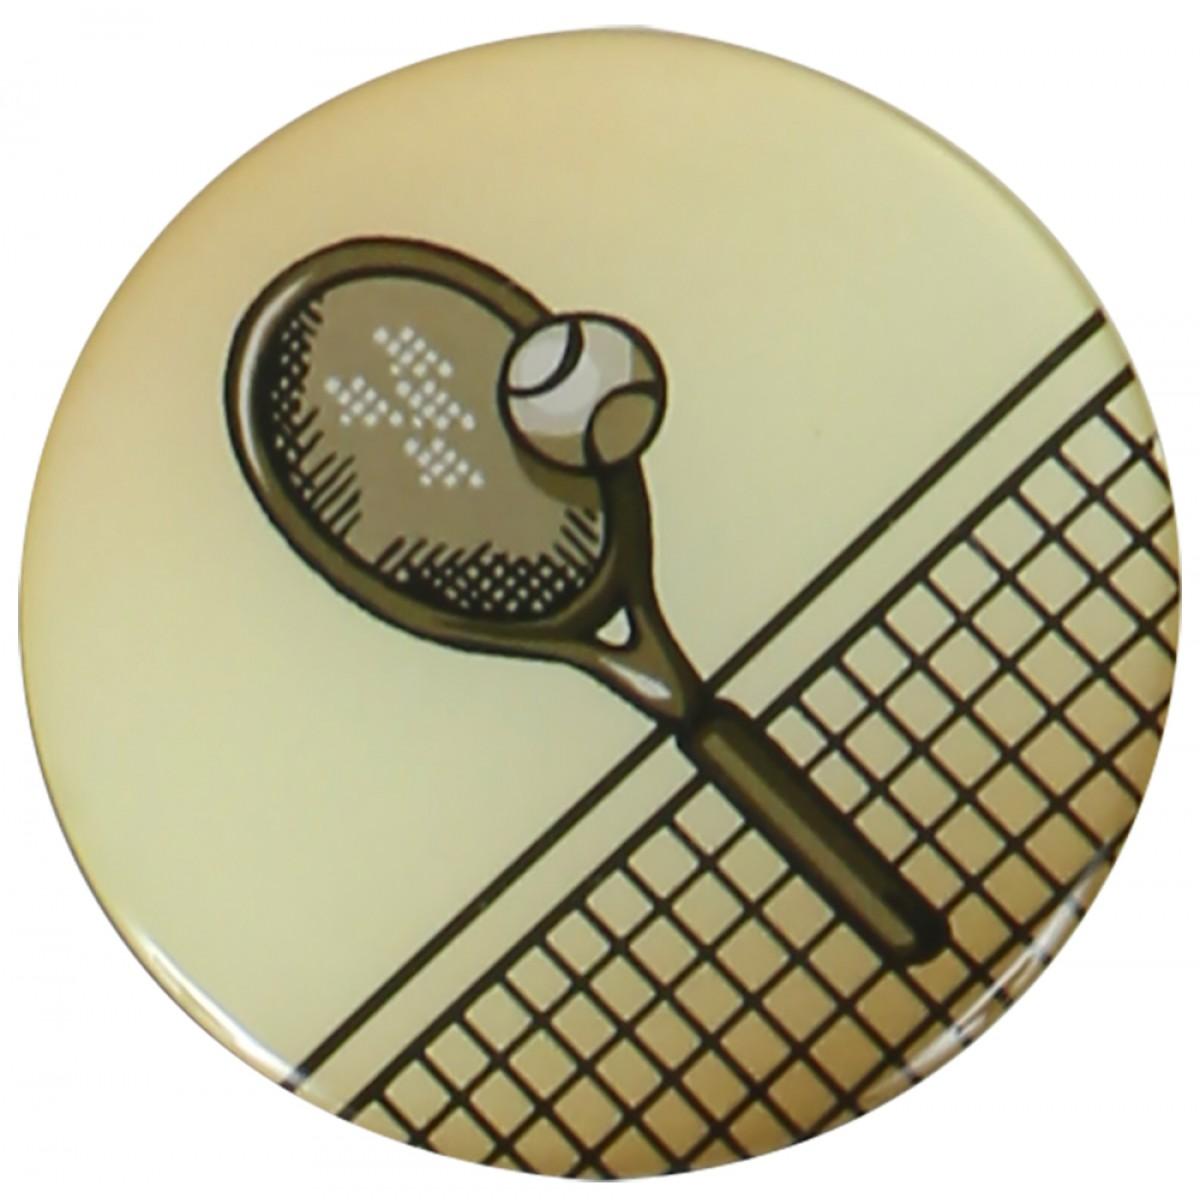 PASTILLES MEDAILLE TENNIS (EPOXY - 25MM)